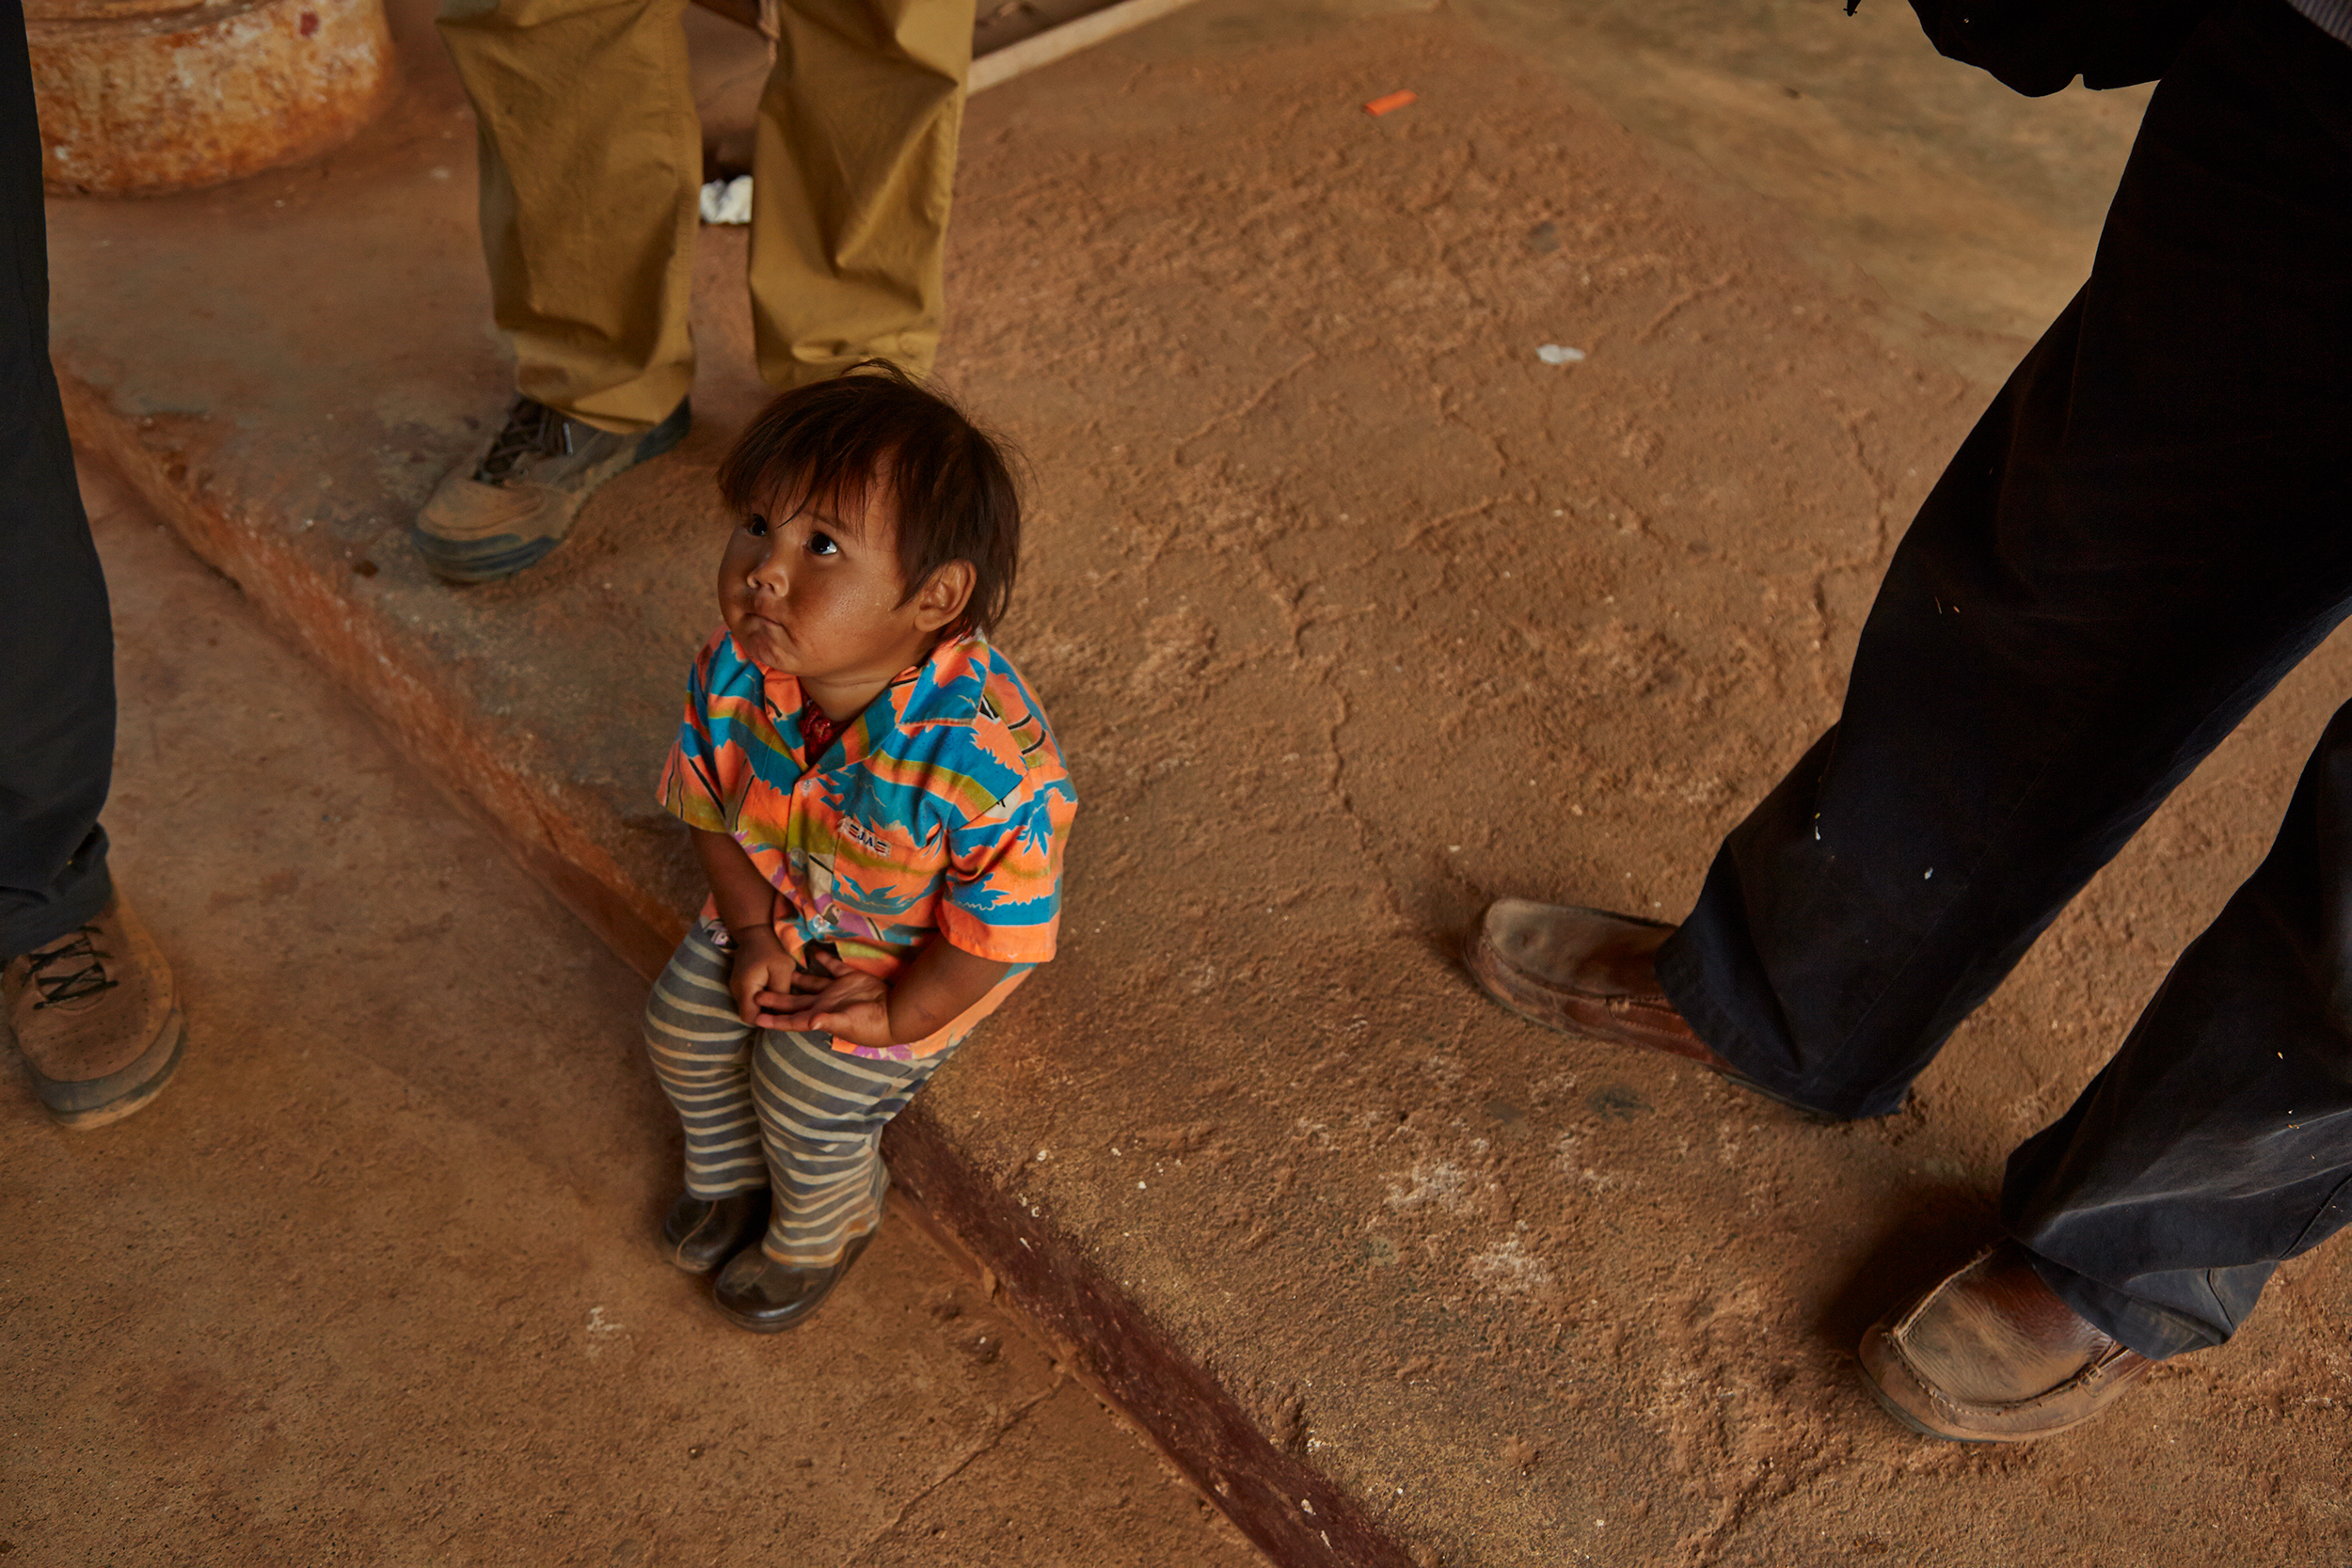 Kanjana-Chaiwatanachai-Image-Works_Mandalay-Riverside-2_2014.01.19_0219w.jpg